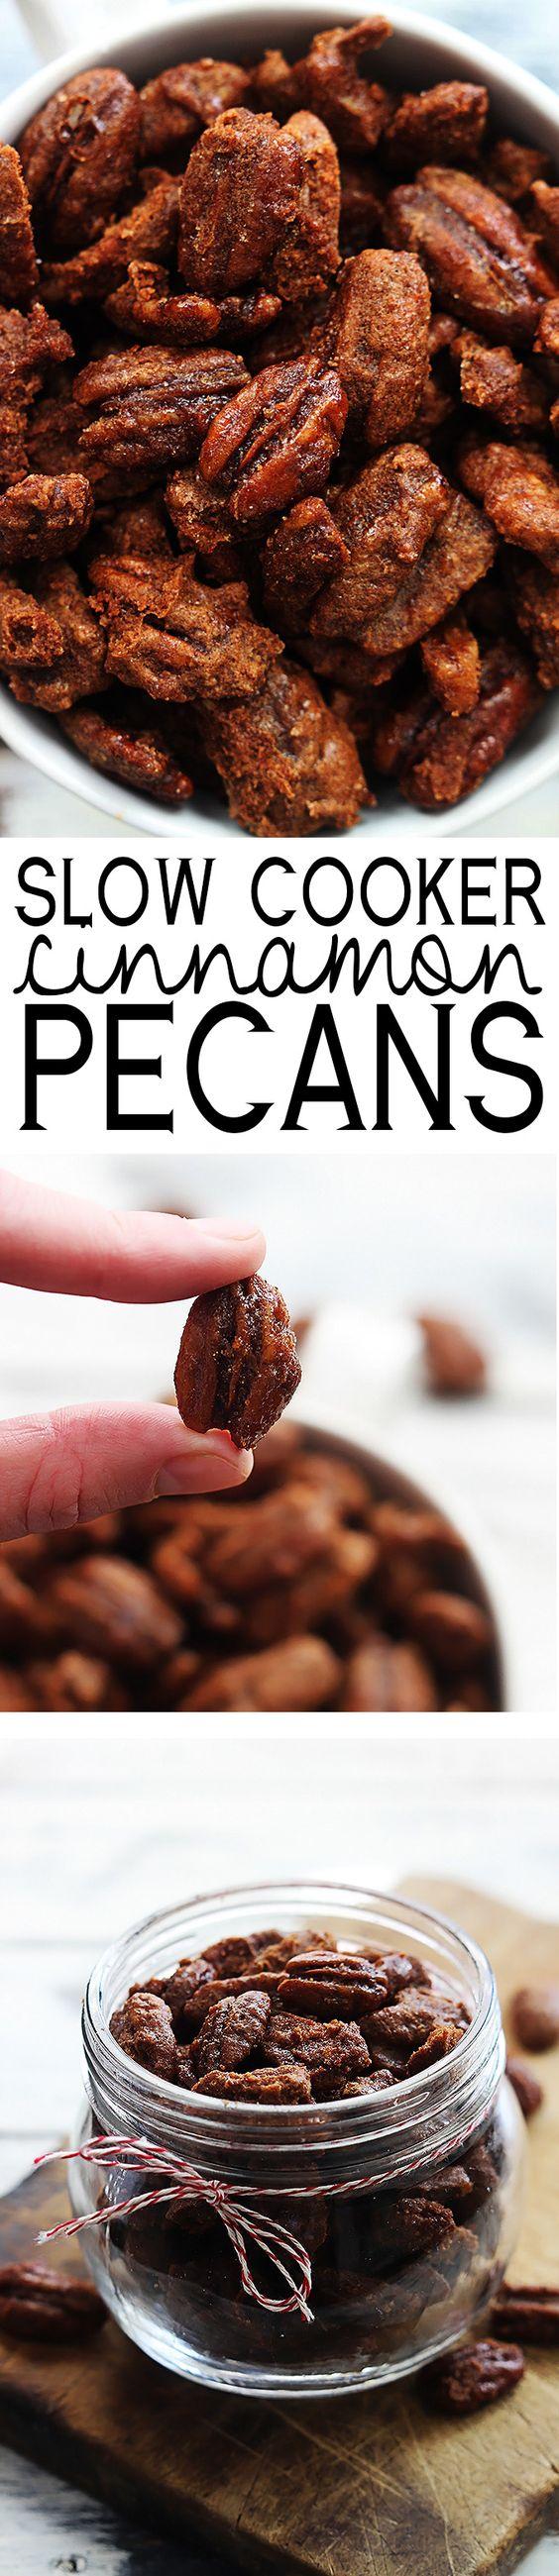 Cinnamon pecans made in a crock pot!